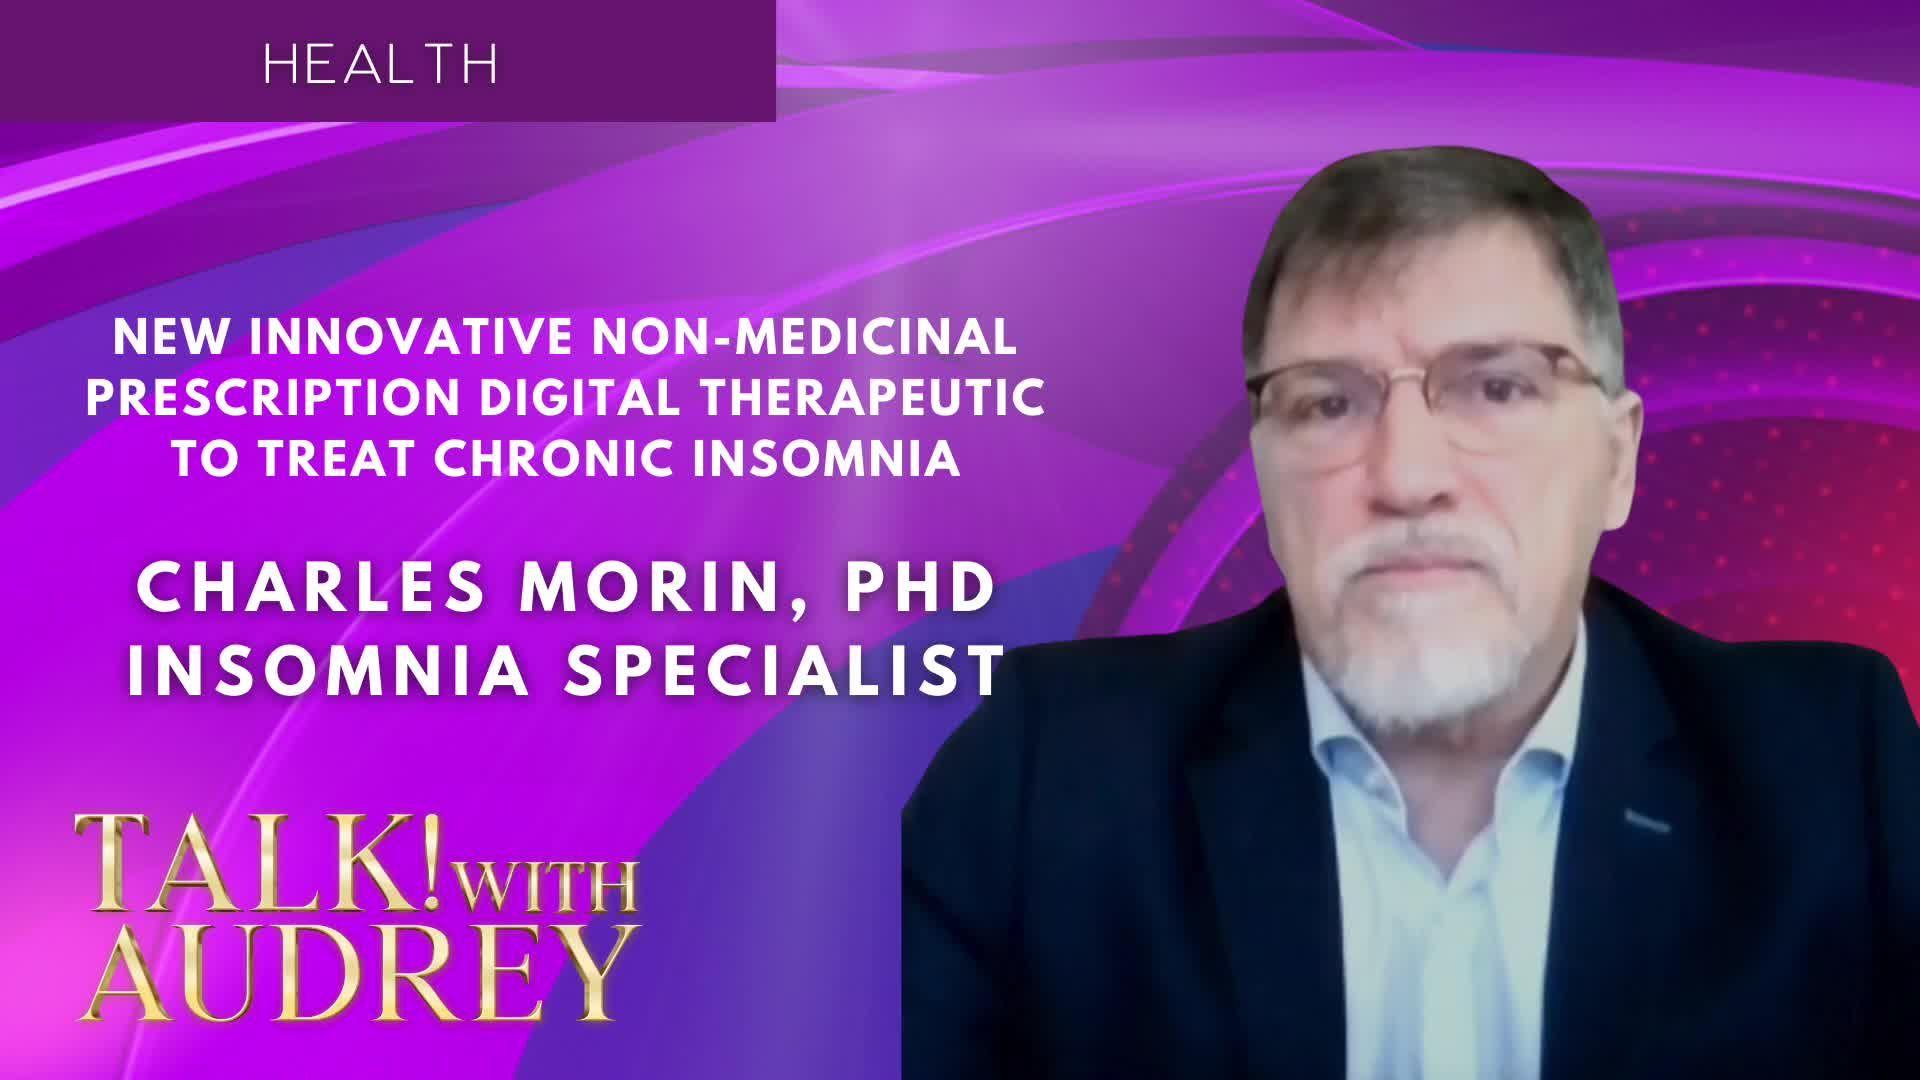 TALK! with AUDREY - Charles Morin, PHD - New Innovative Non-Medicinal Prescription Digital Therapeutic to Treat Chronic Insomnia